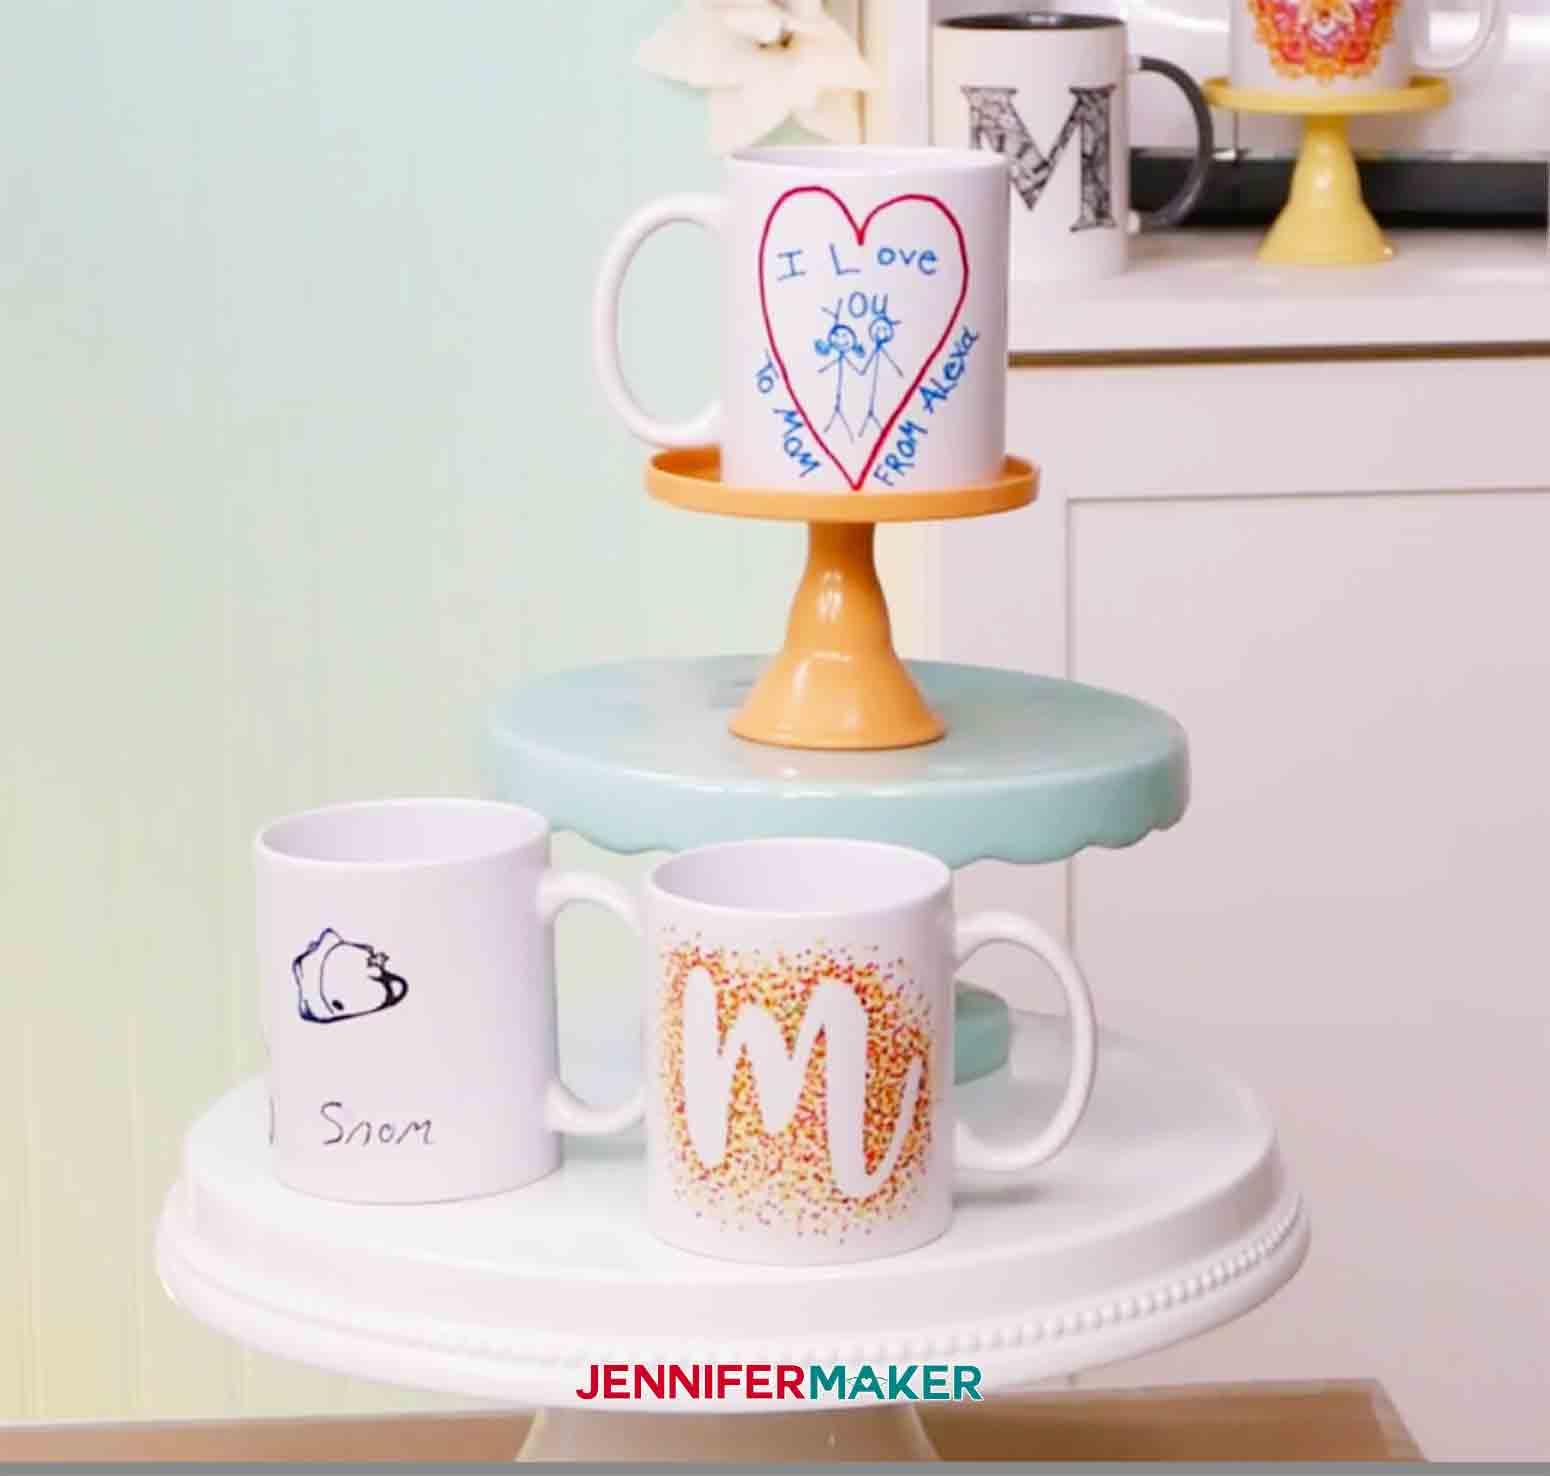 showing three freehand mugs on pedestal jennifermaker